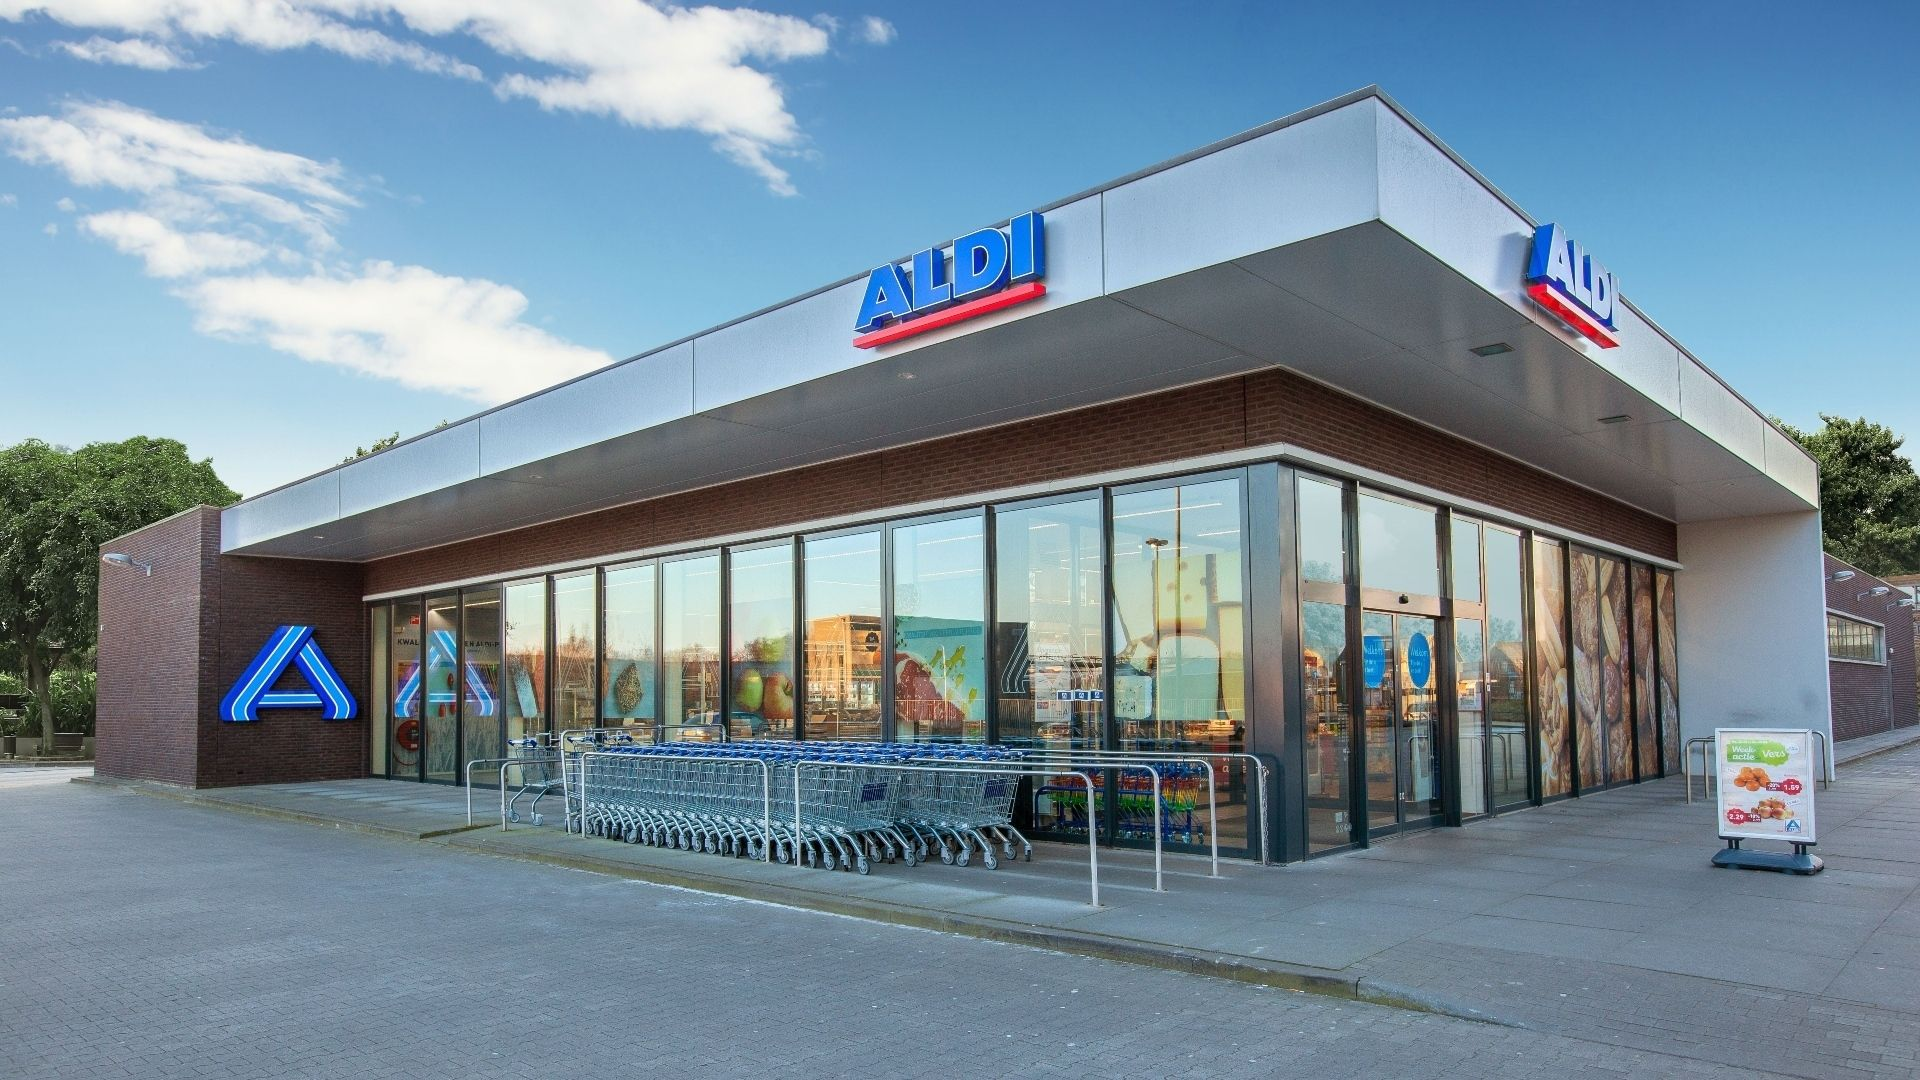 Aldi openingstijden supermarkt pasen 2021